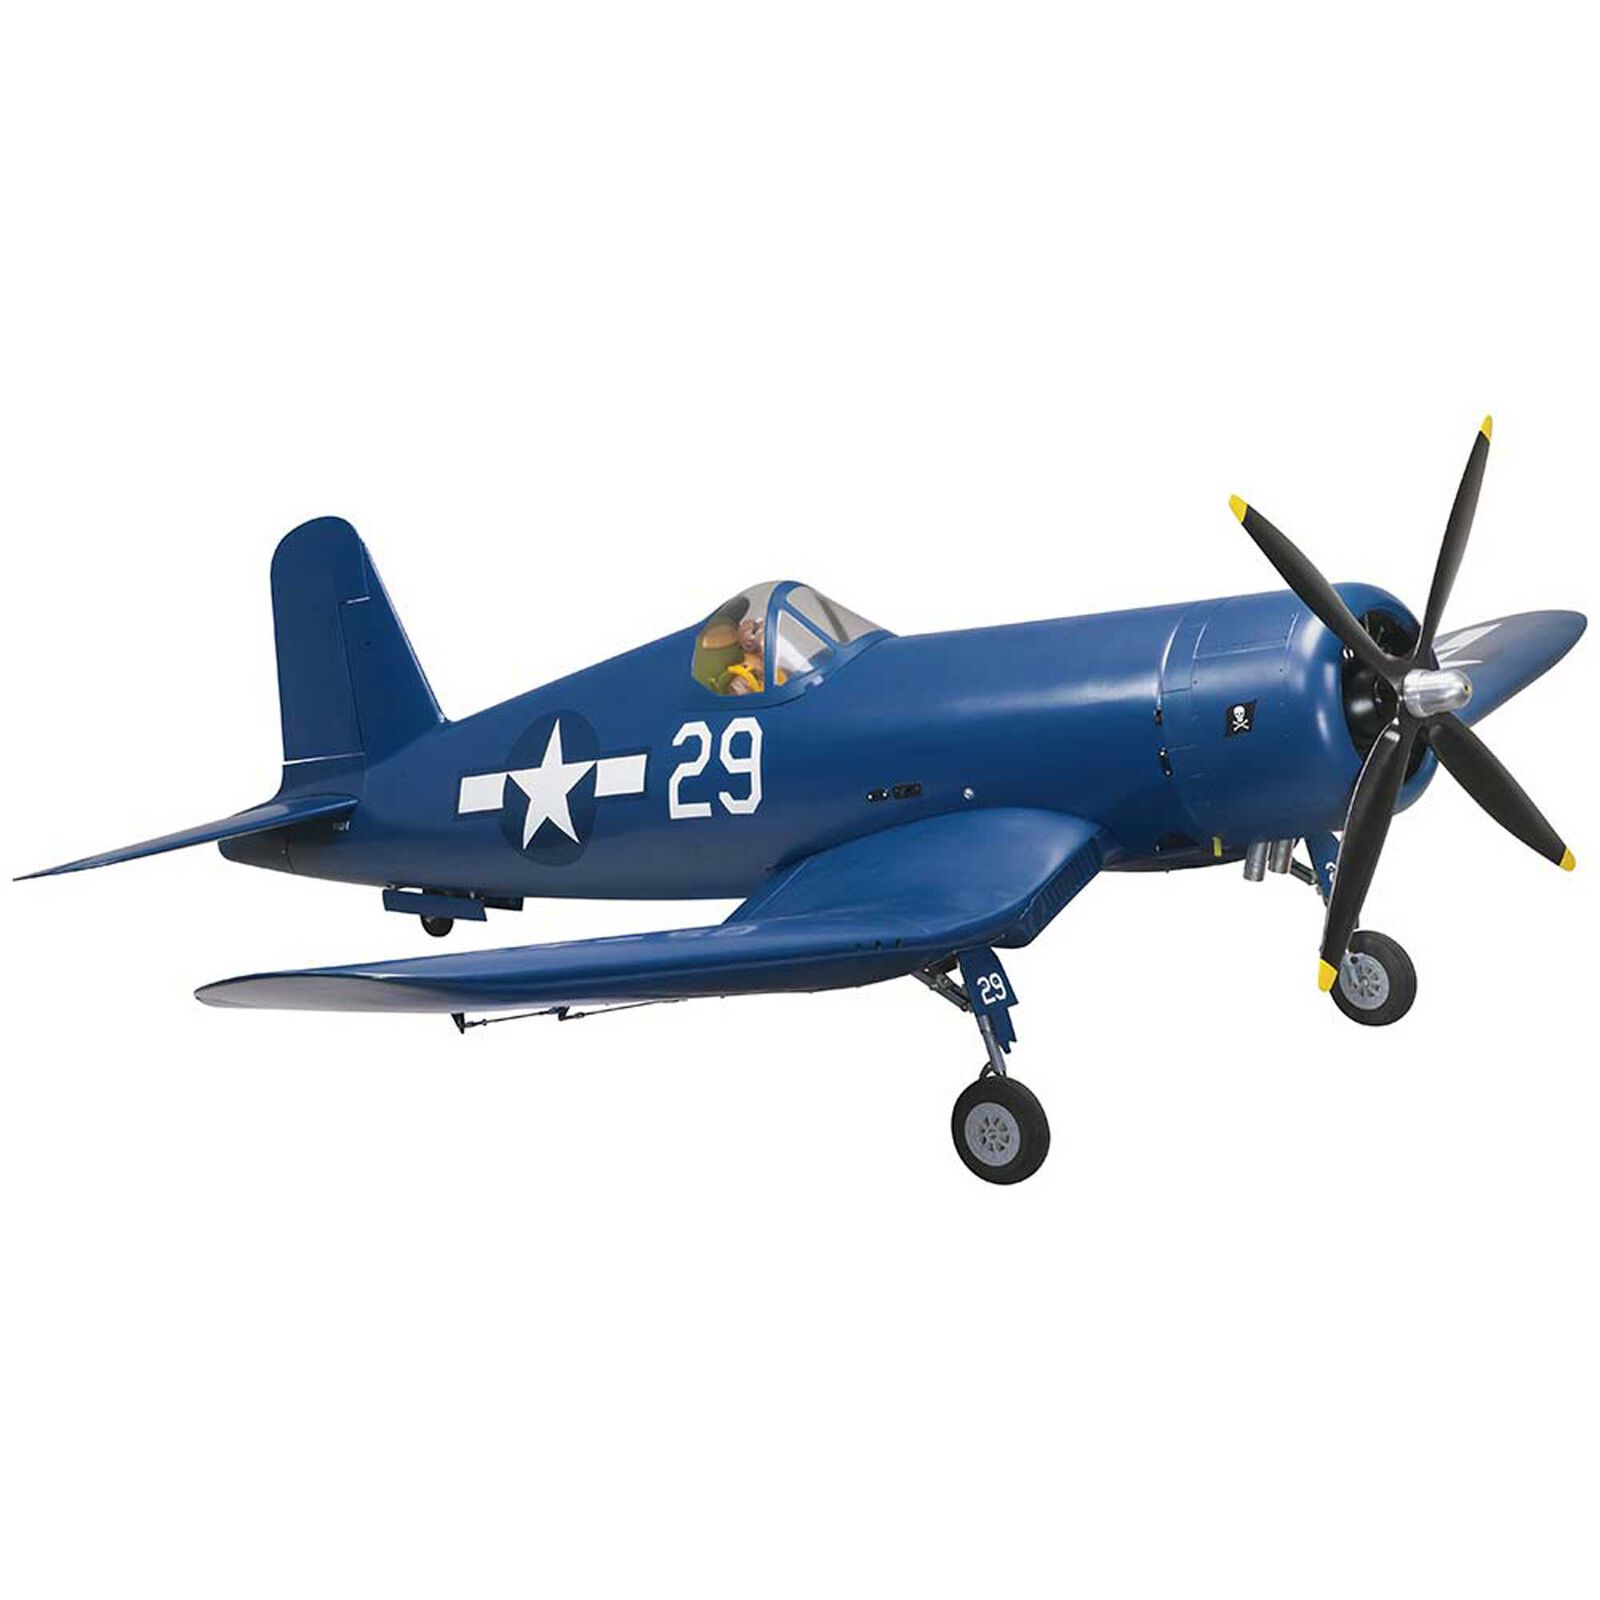 "Giant F4U Corsair 50-55cc Gas ARF, 86.5"""